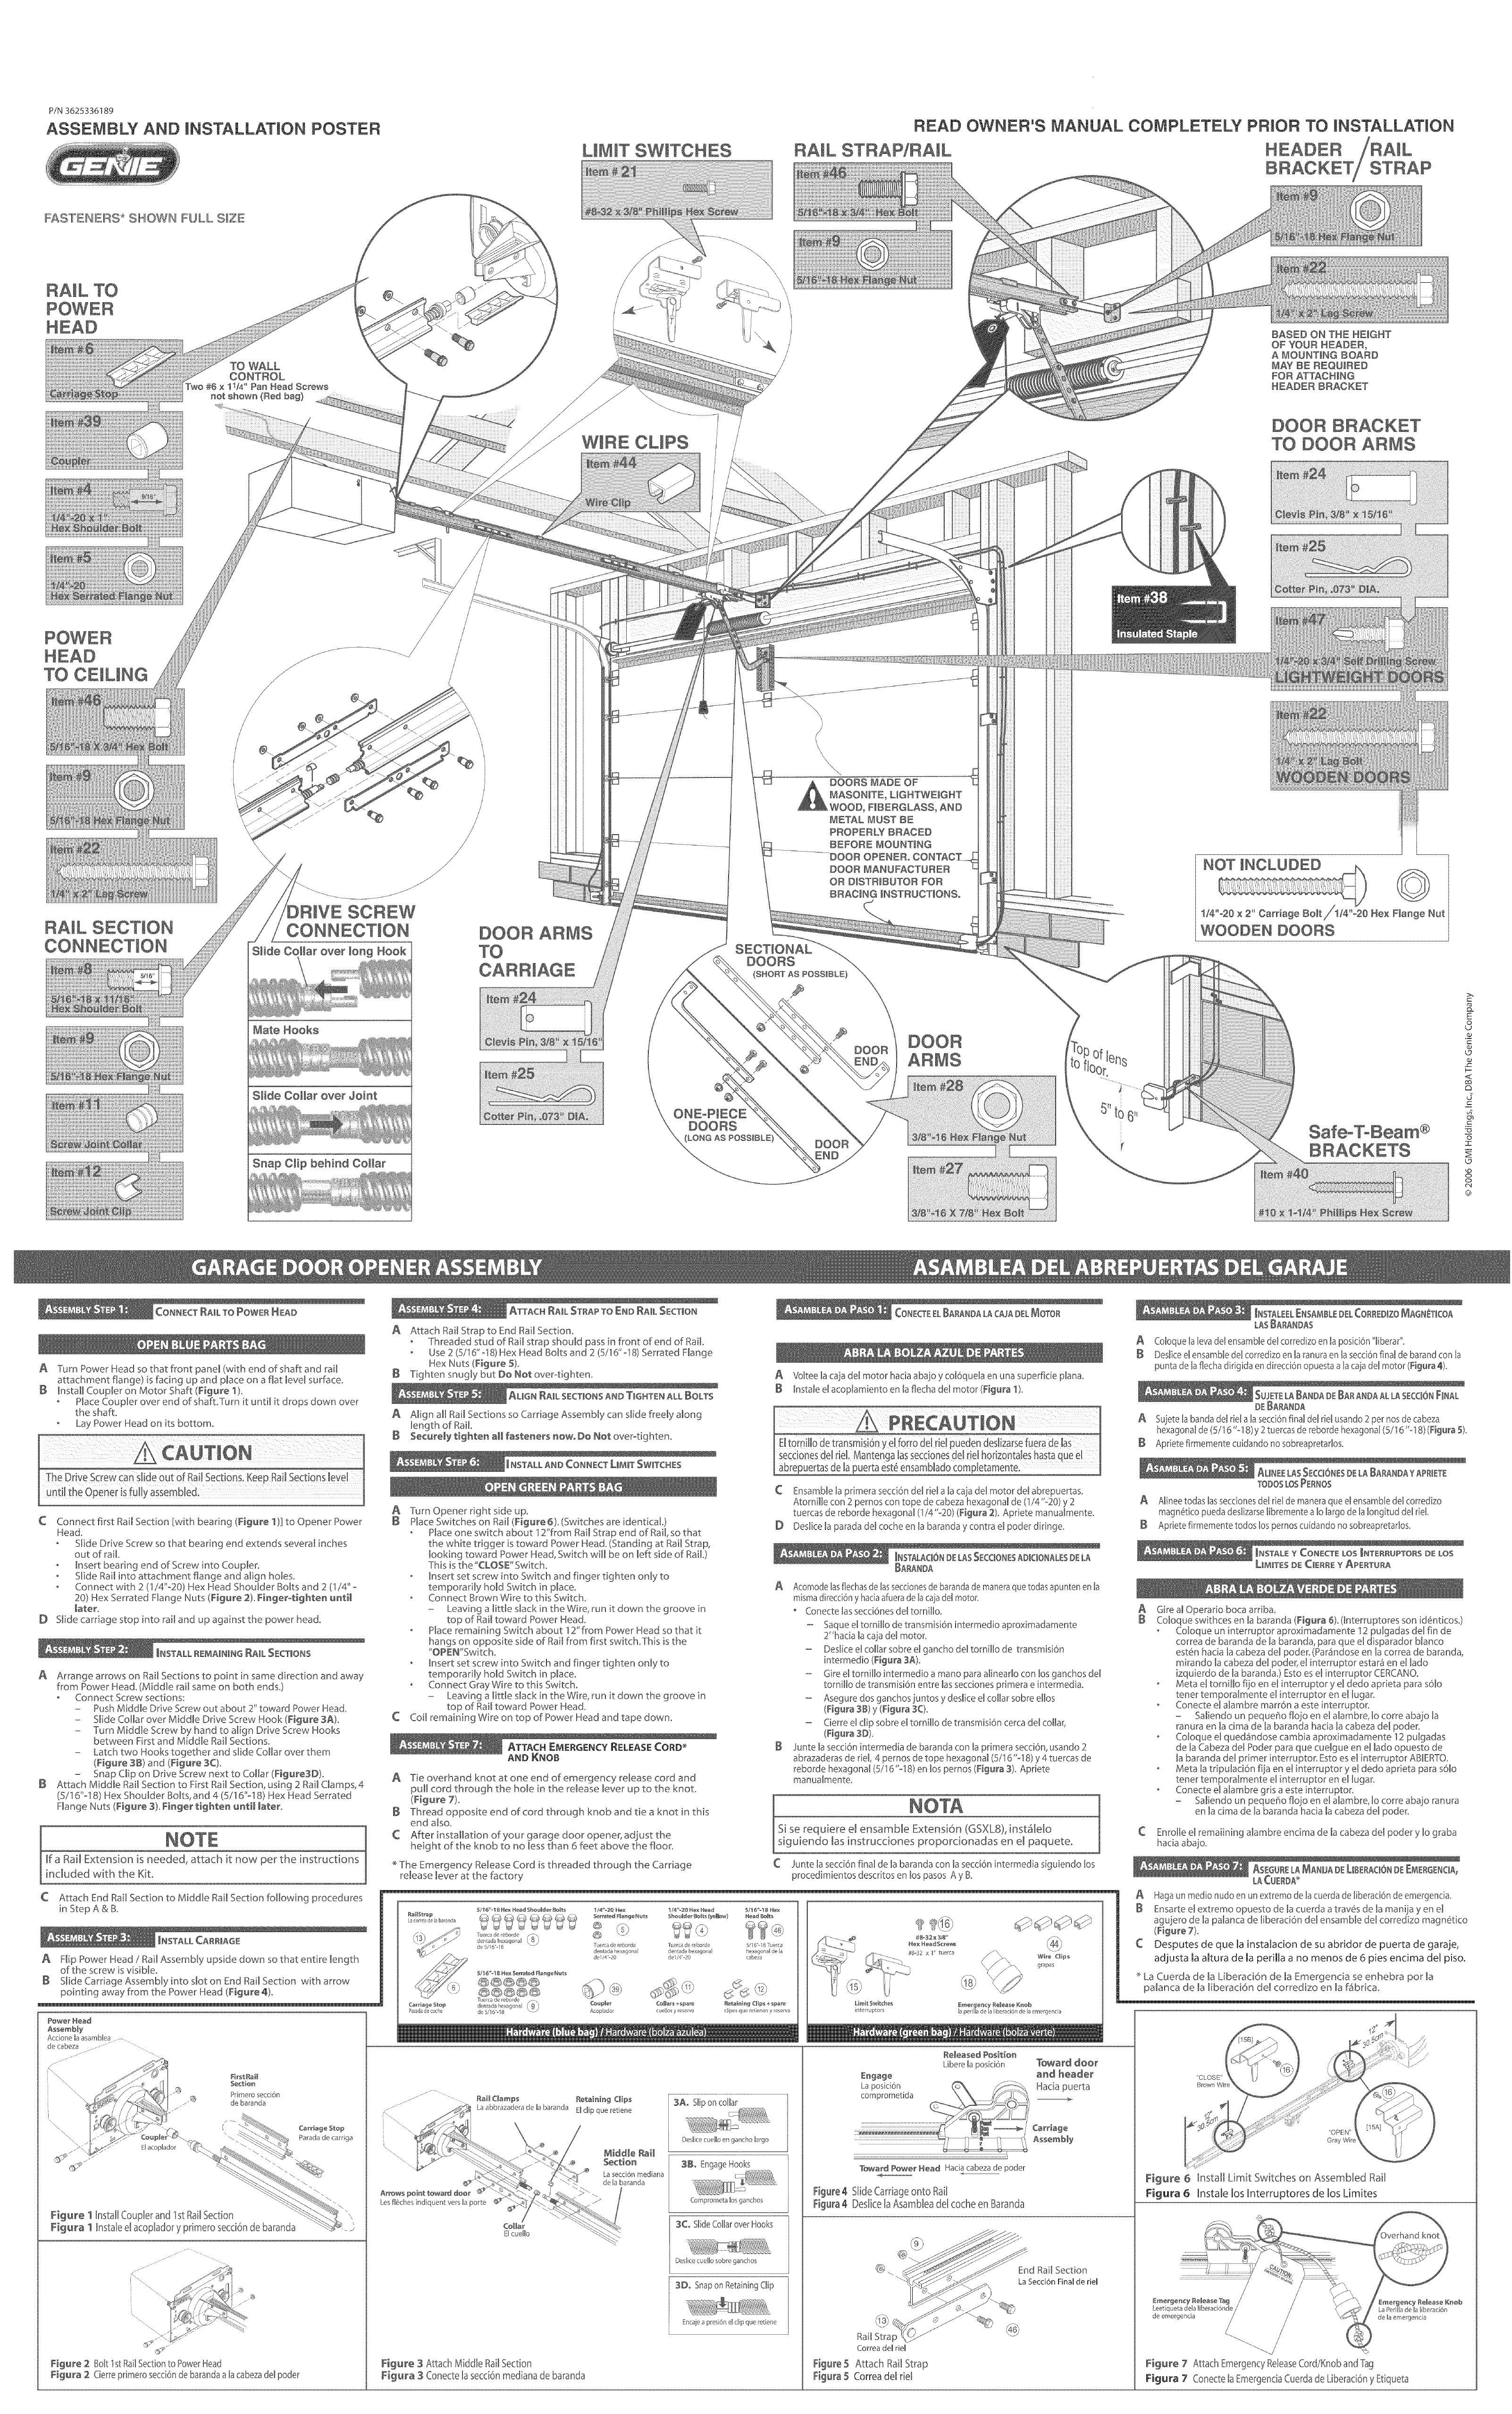 Genie garage door opener troubleshooting guide httpvoteno123 genie garage door opener troubleshooting guide rubansaba